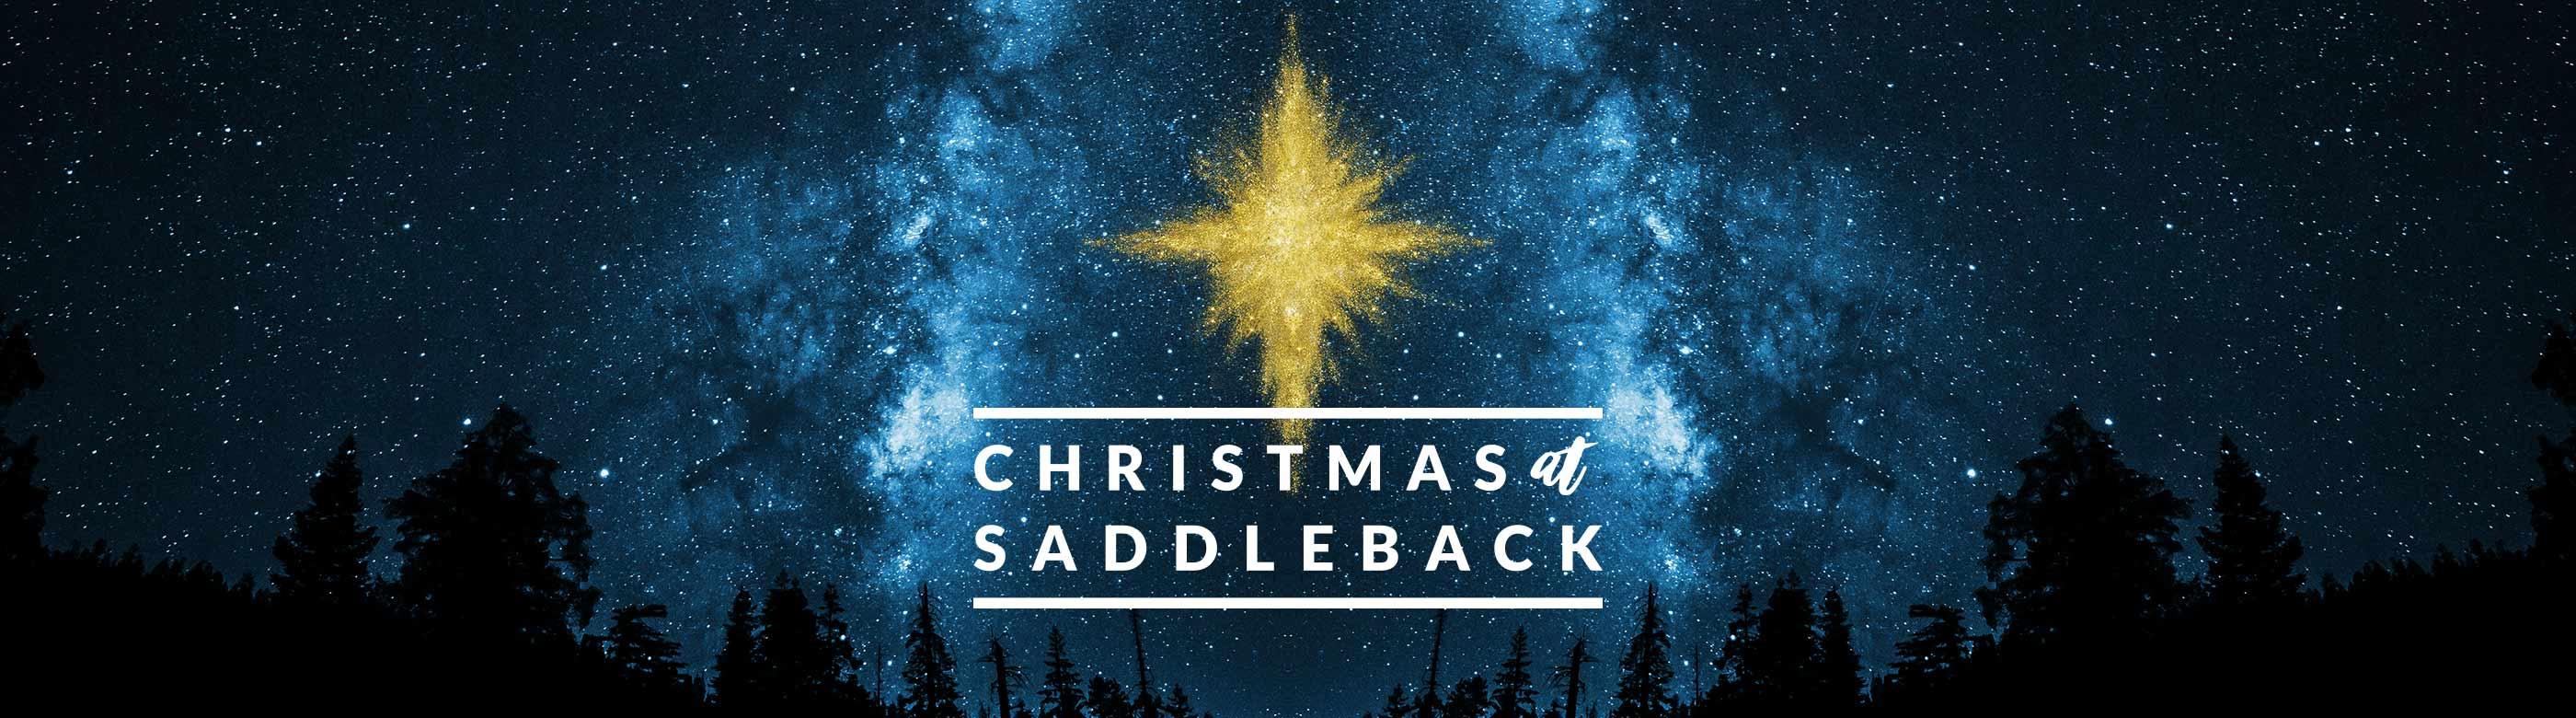 Saddleback Church Christmas 2020 Saddleback Church: Events: Family Christmas Card Photo Weekend